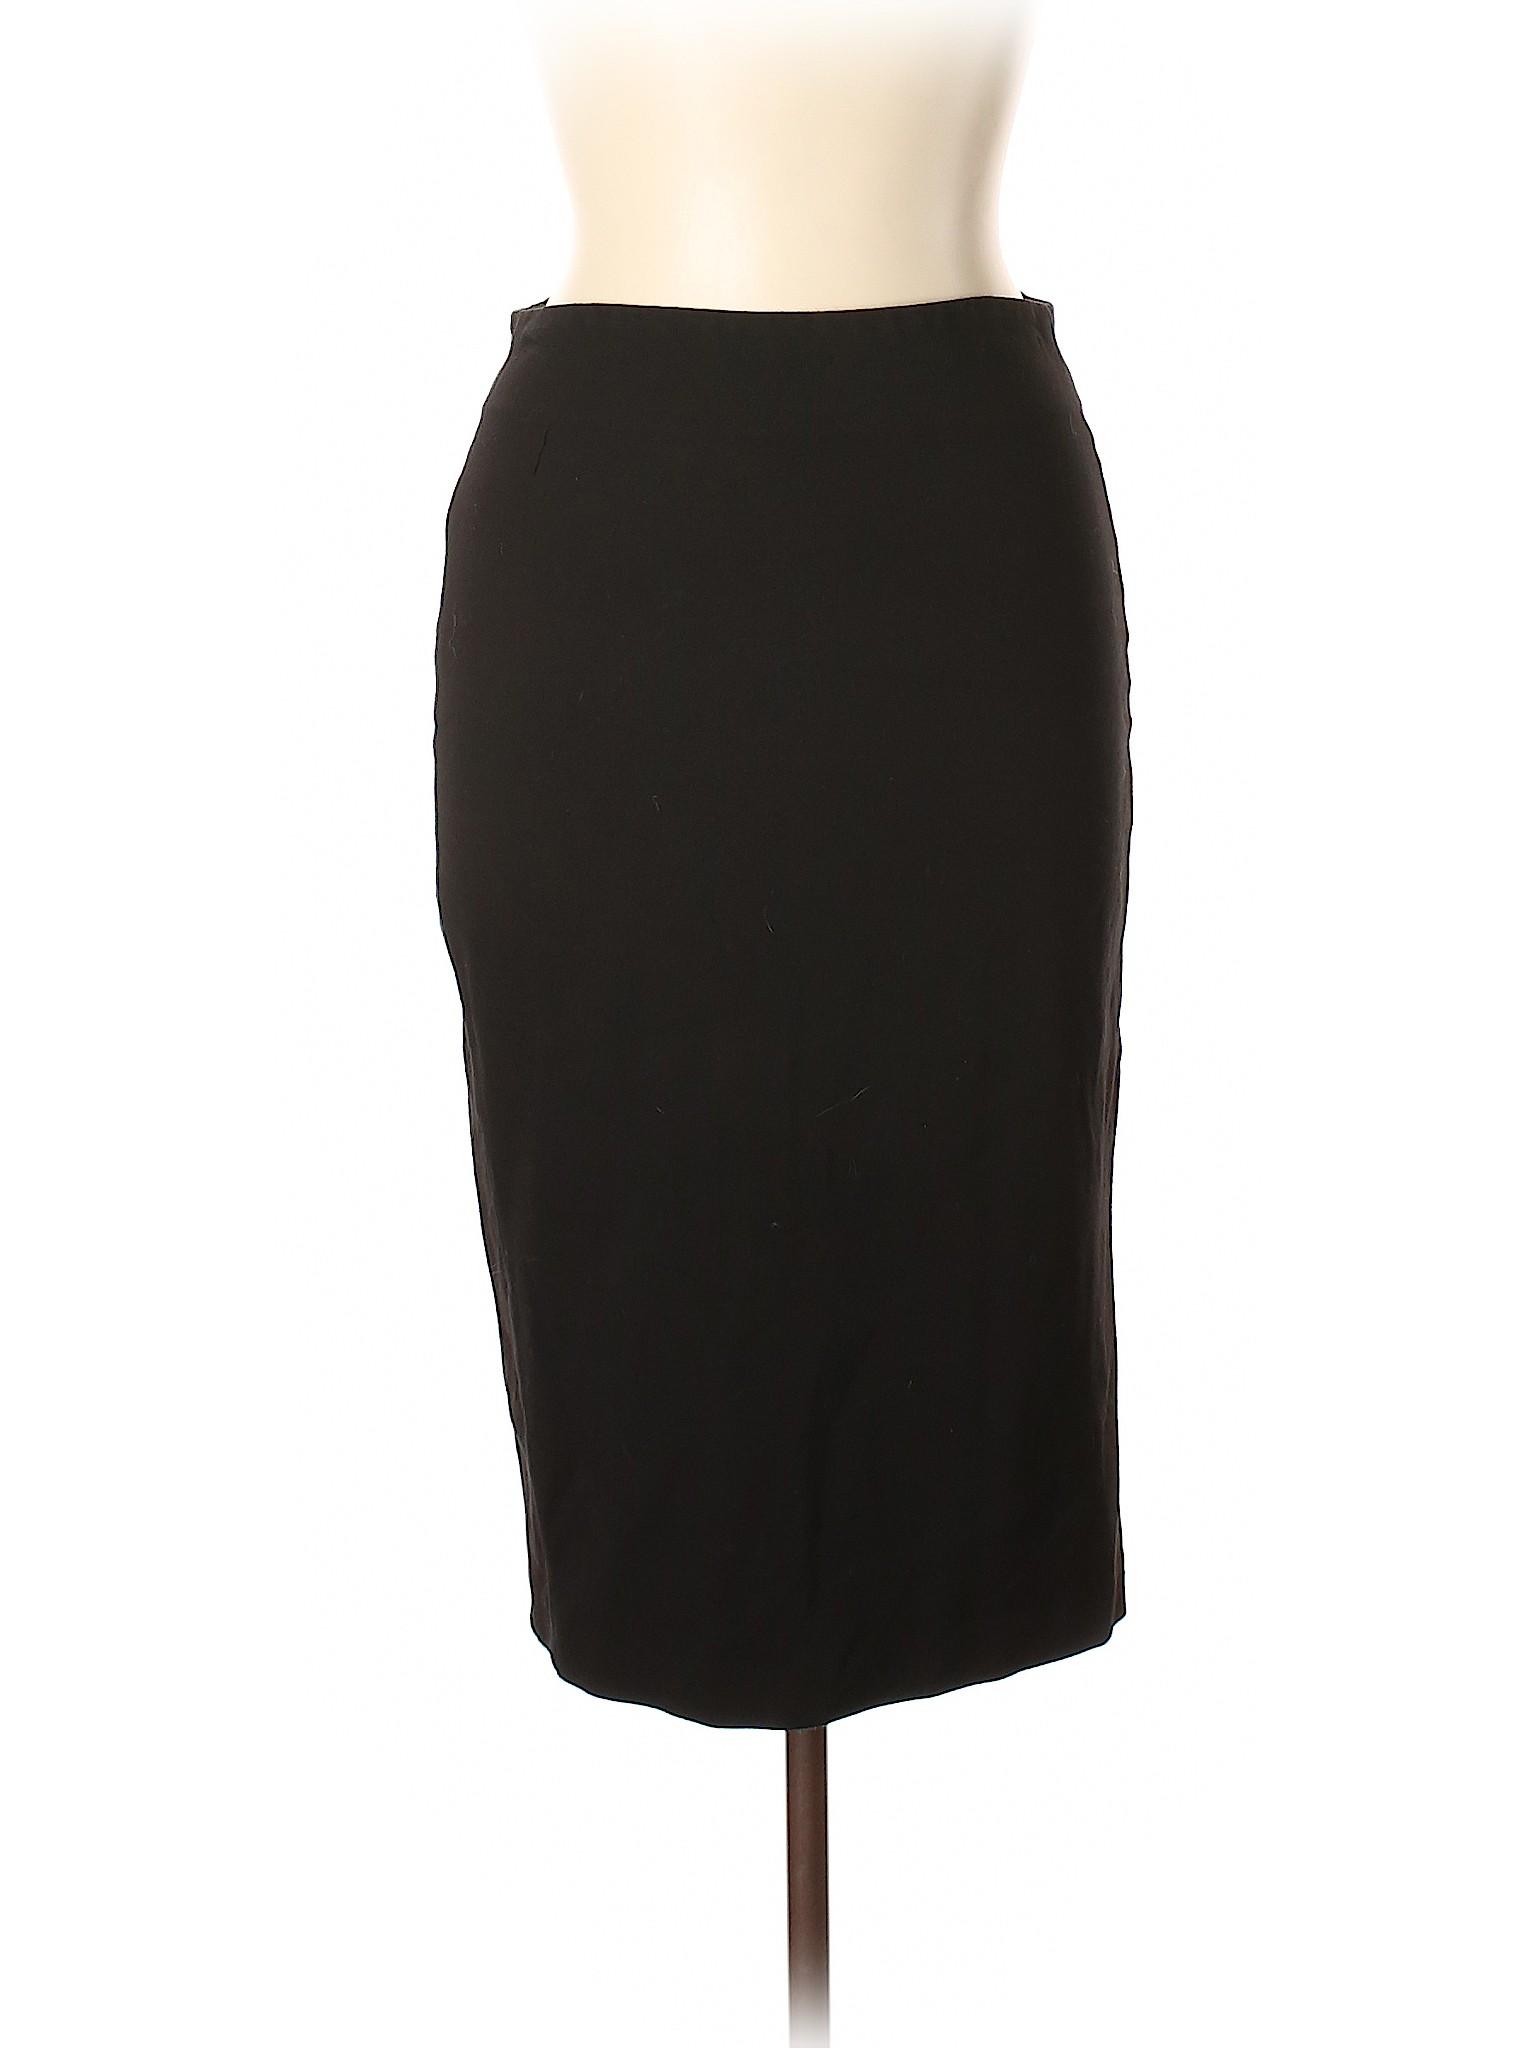 Casual Leisure Skirt Boutique Vince Camuto tSqtwp